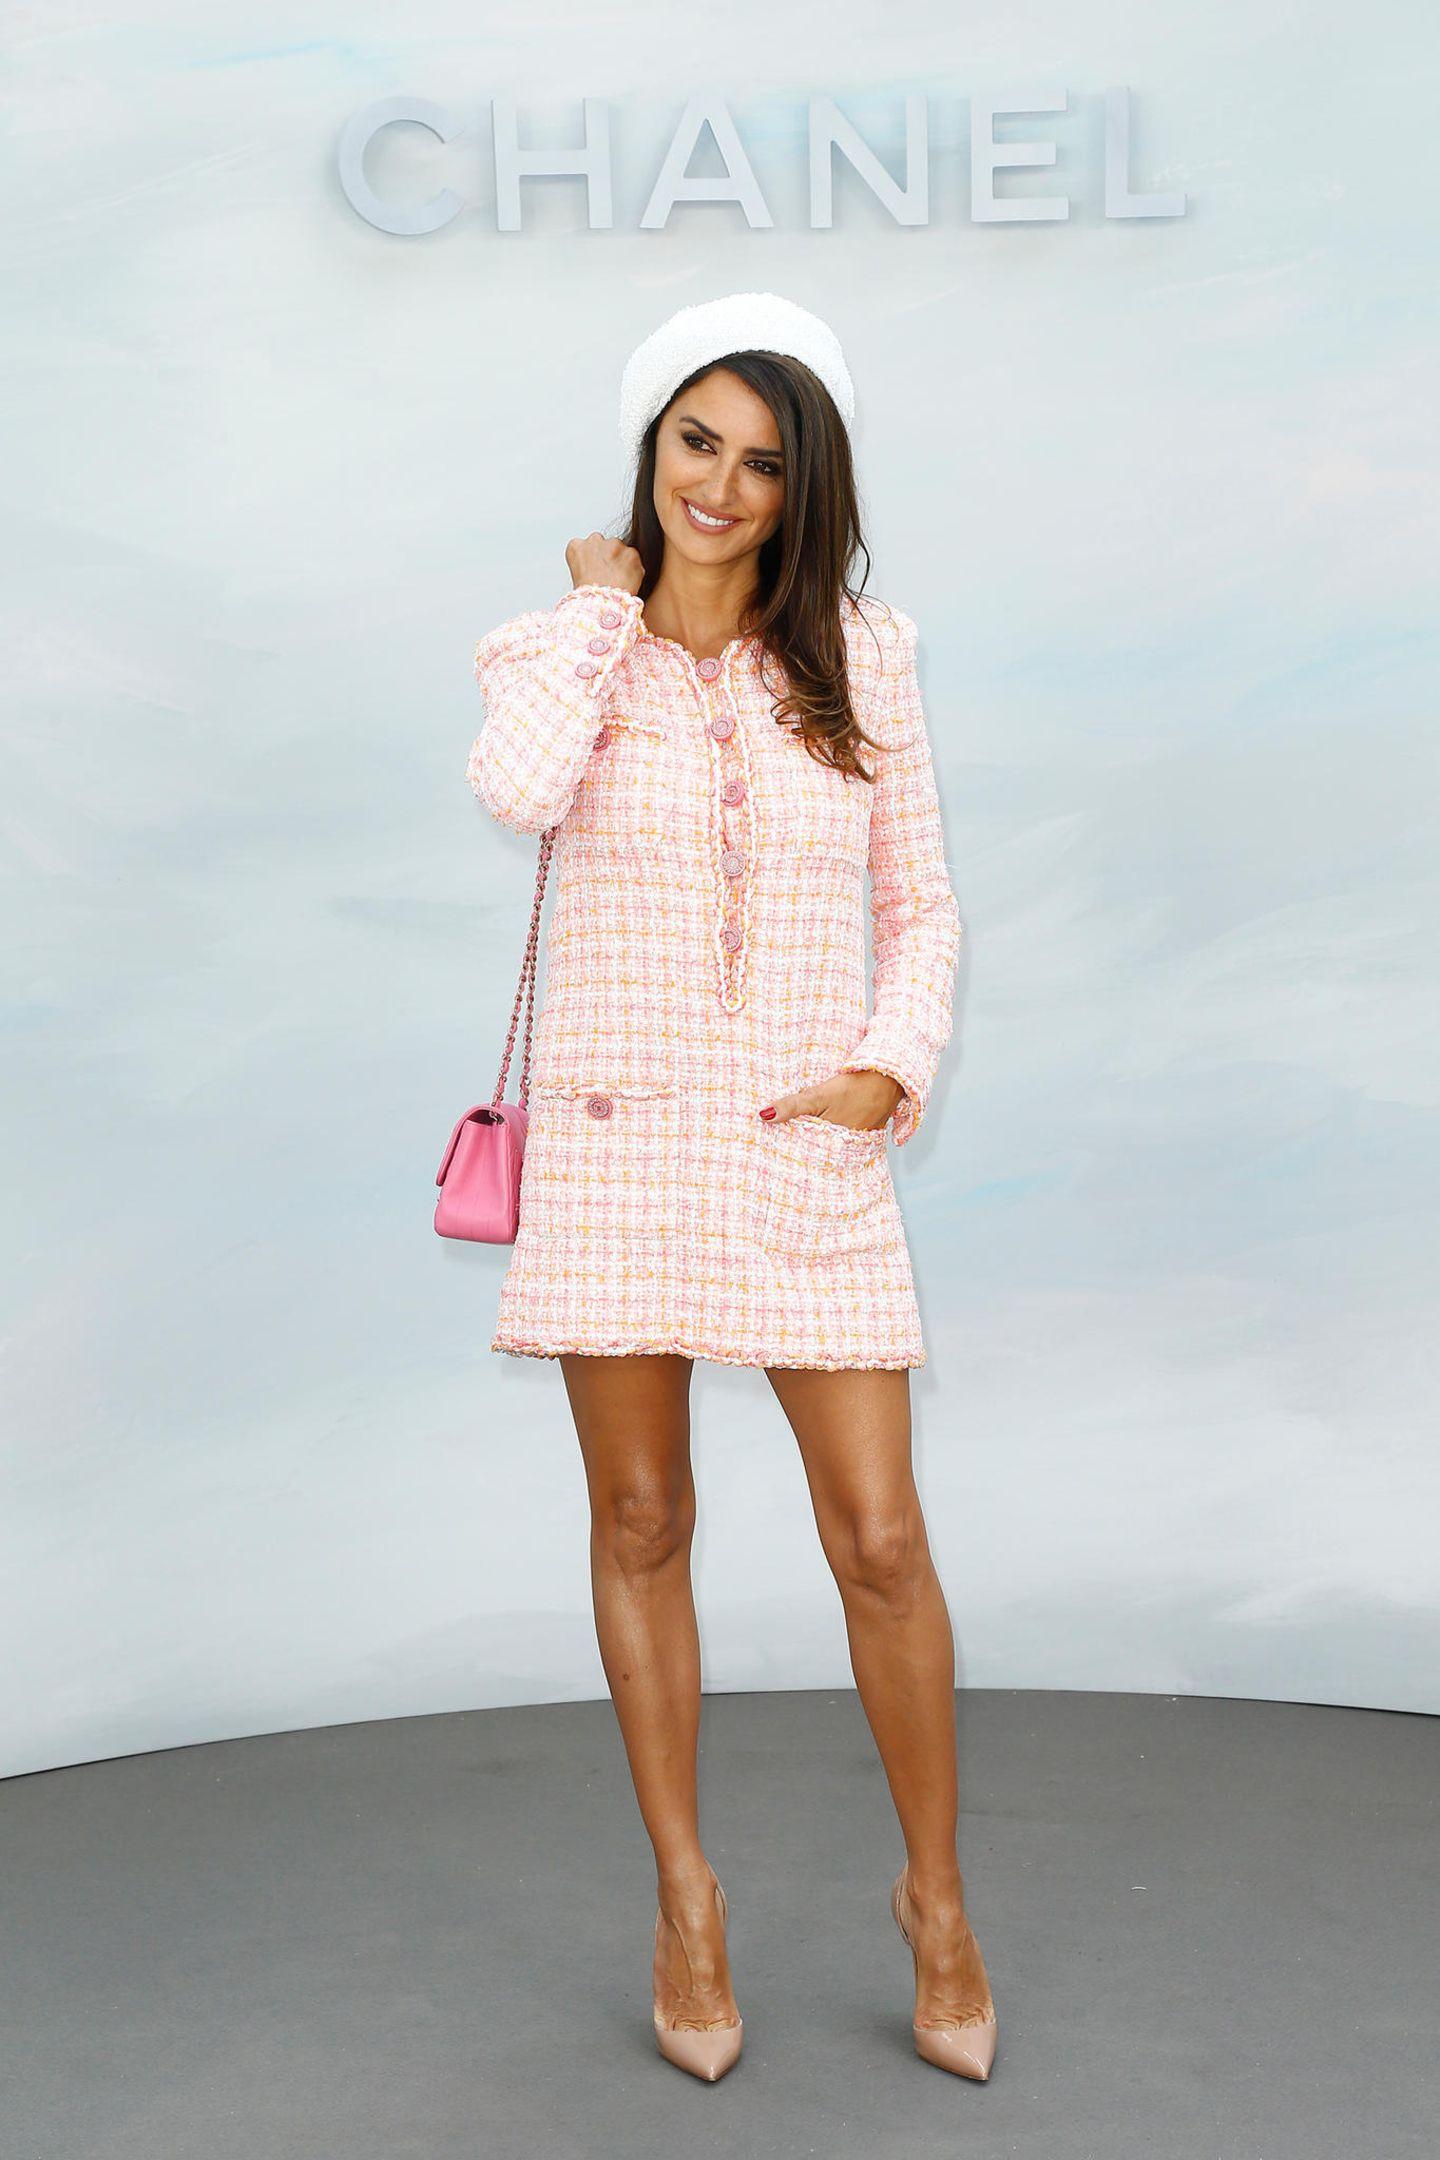 Chanel-Looks: Penélope Cruz in Chanel